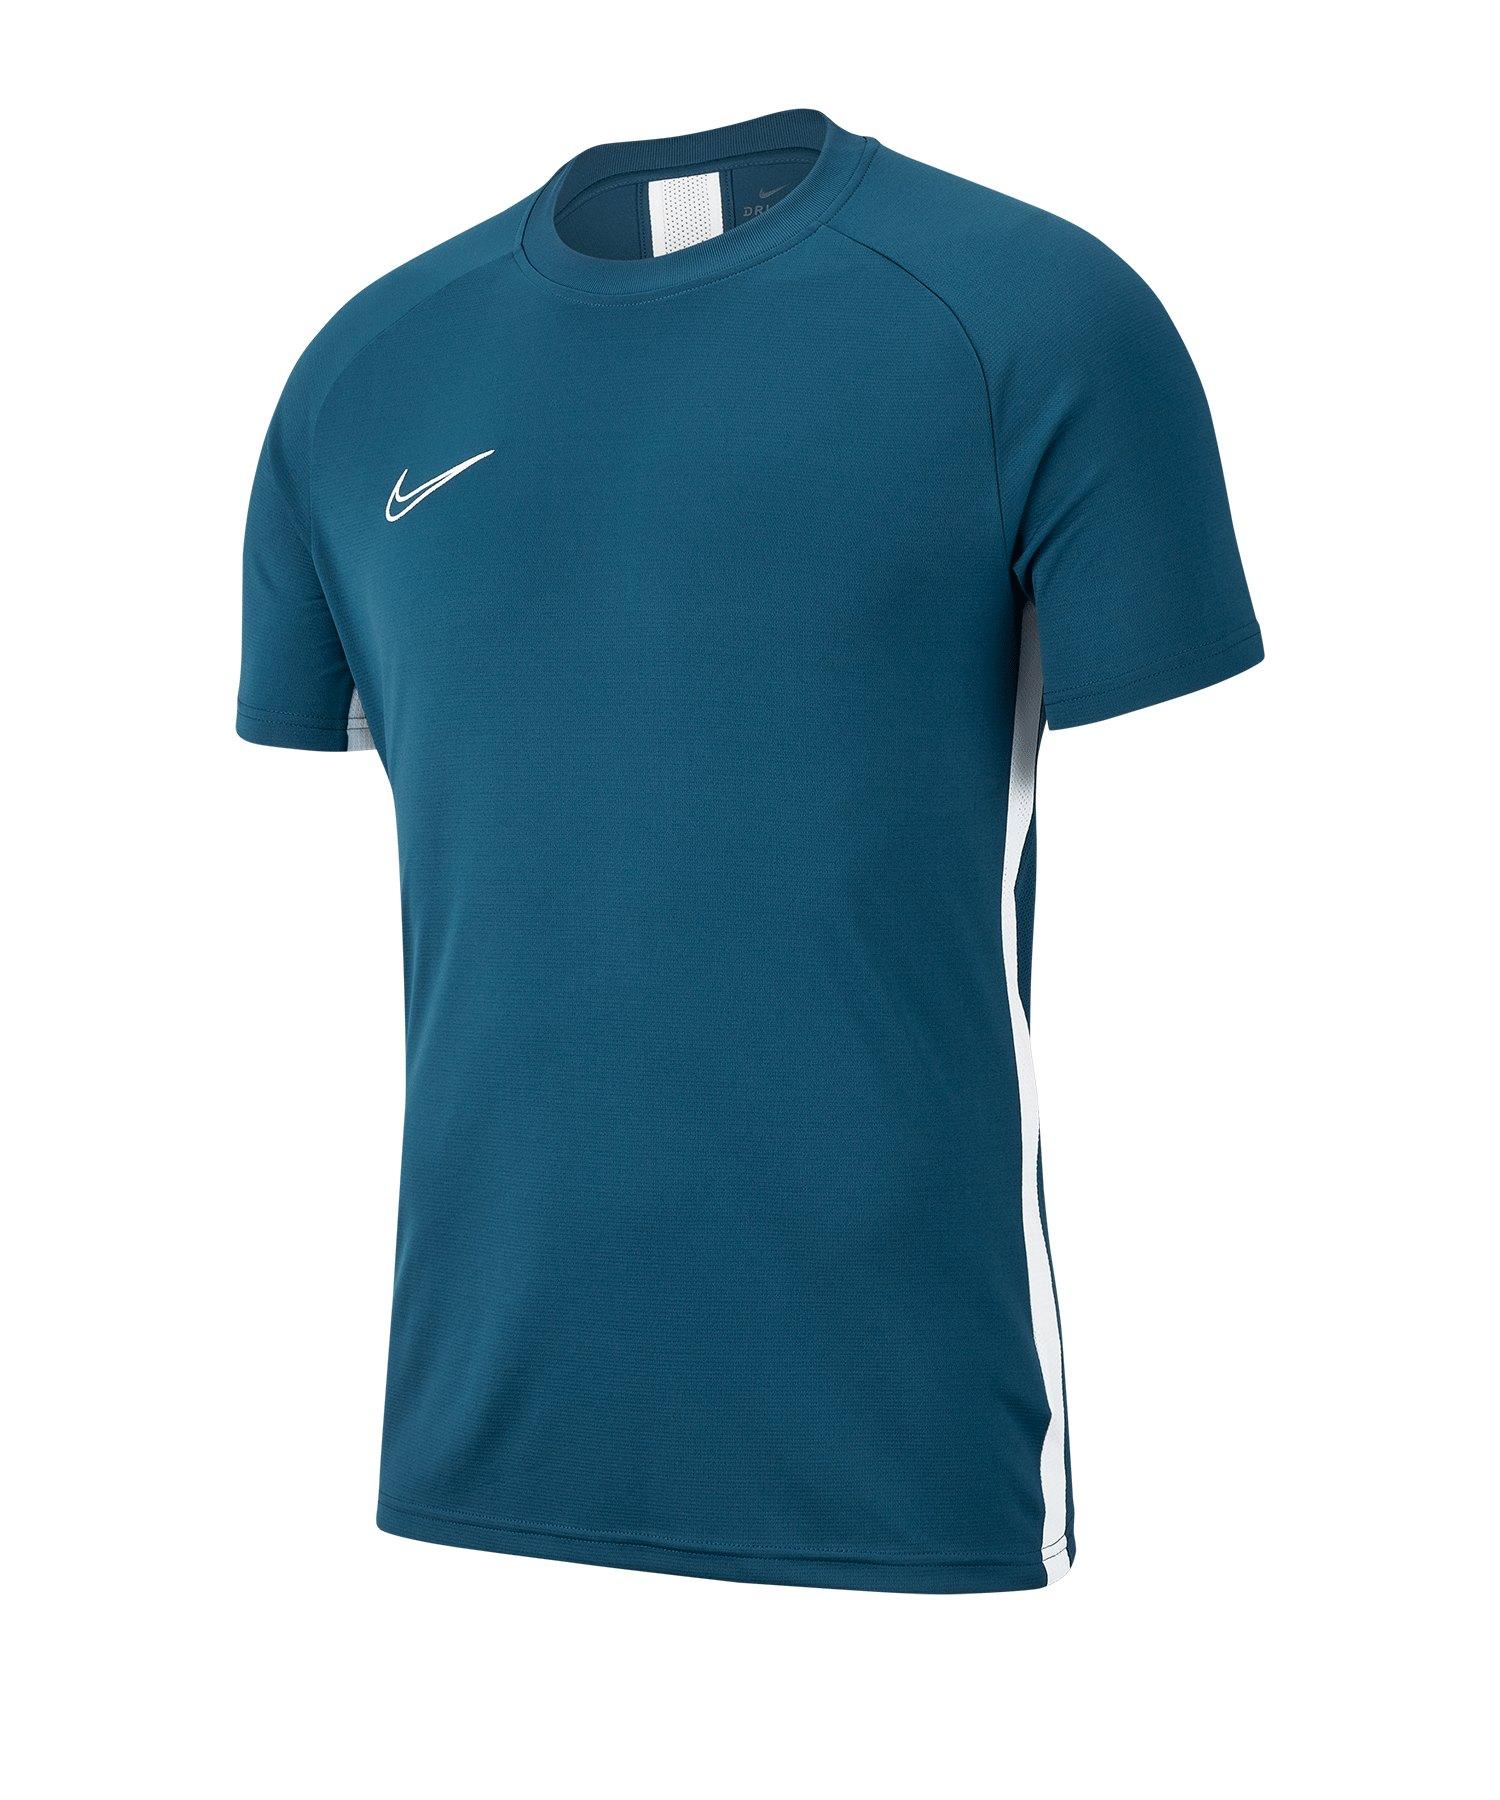 Nike Academy 19 Dri-FIT T-Shirt Kids Blau F404 - blau